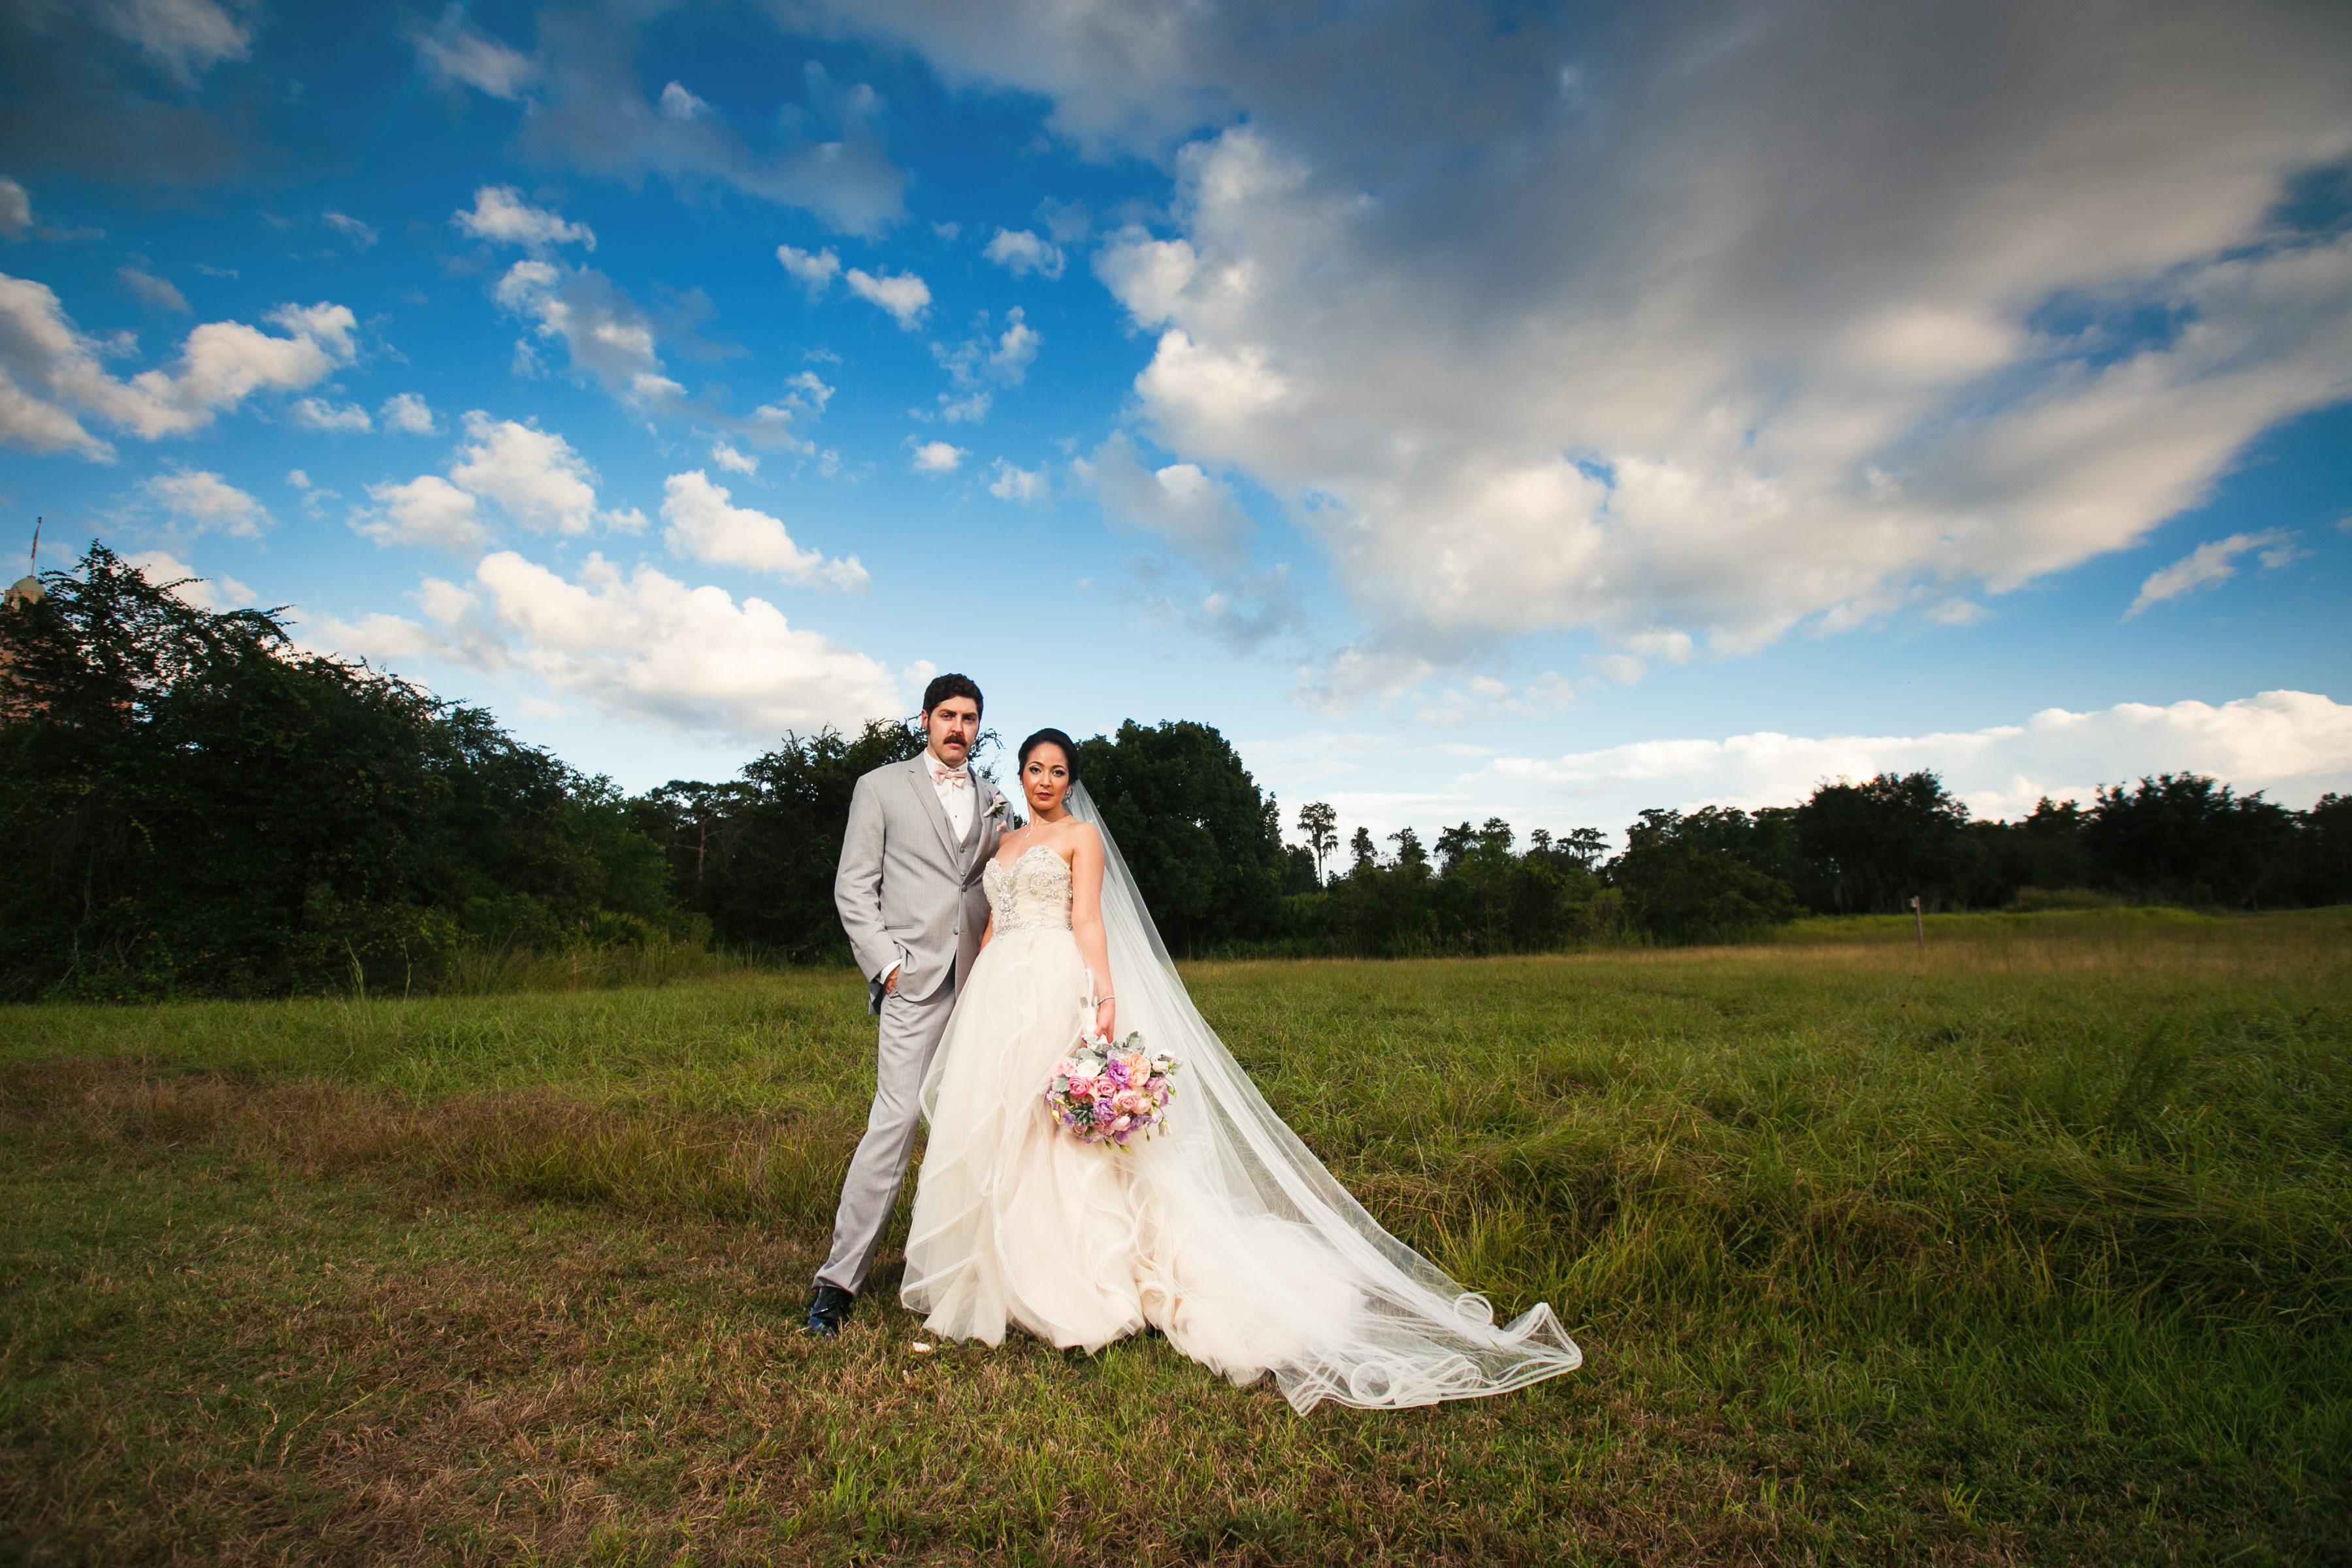 151010-Falcon-Wedding-4568-Edit